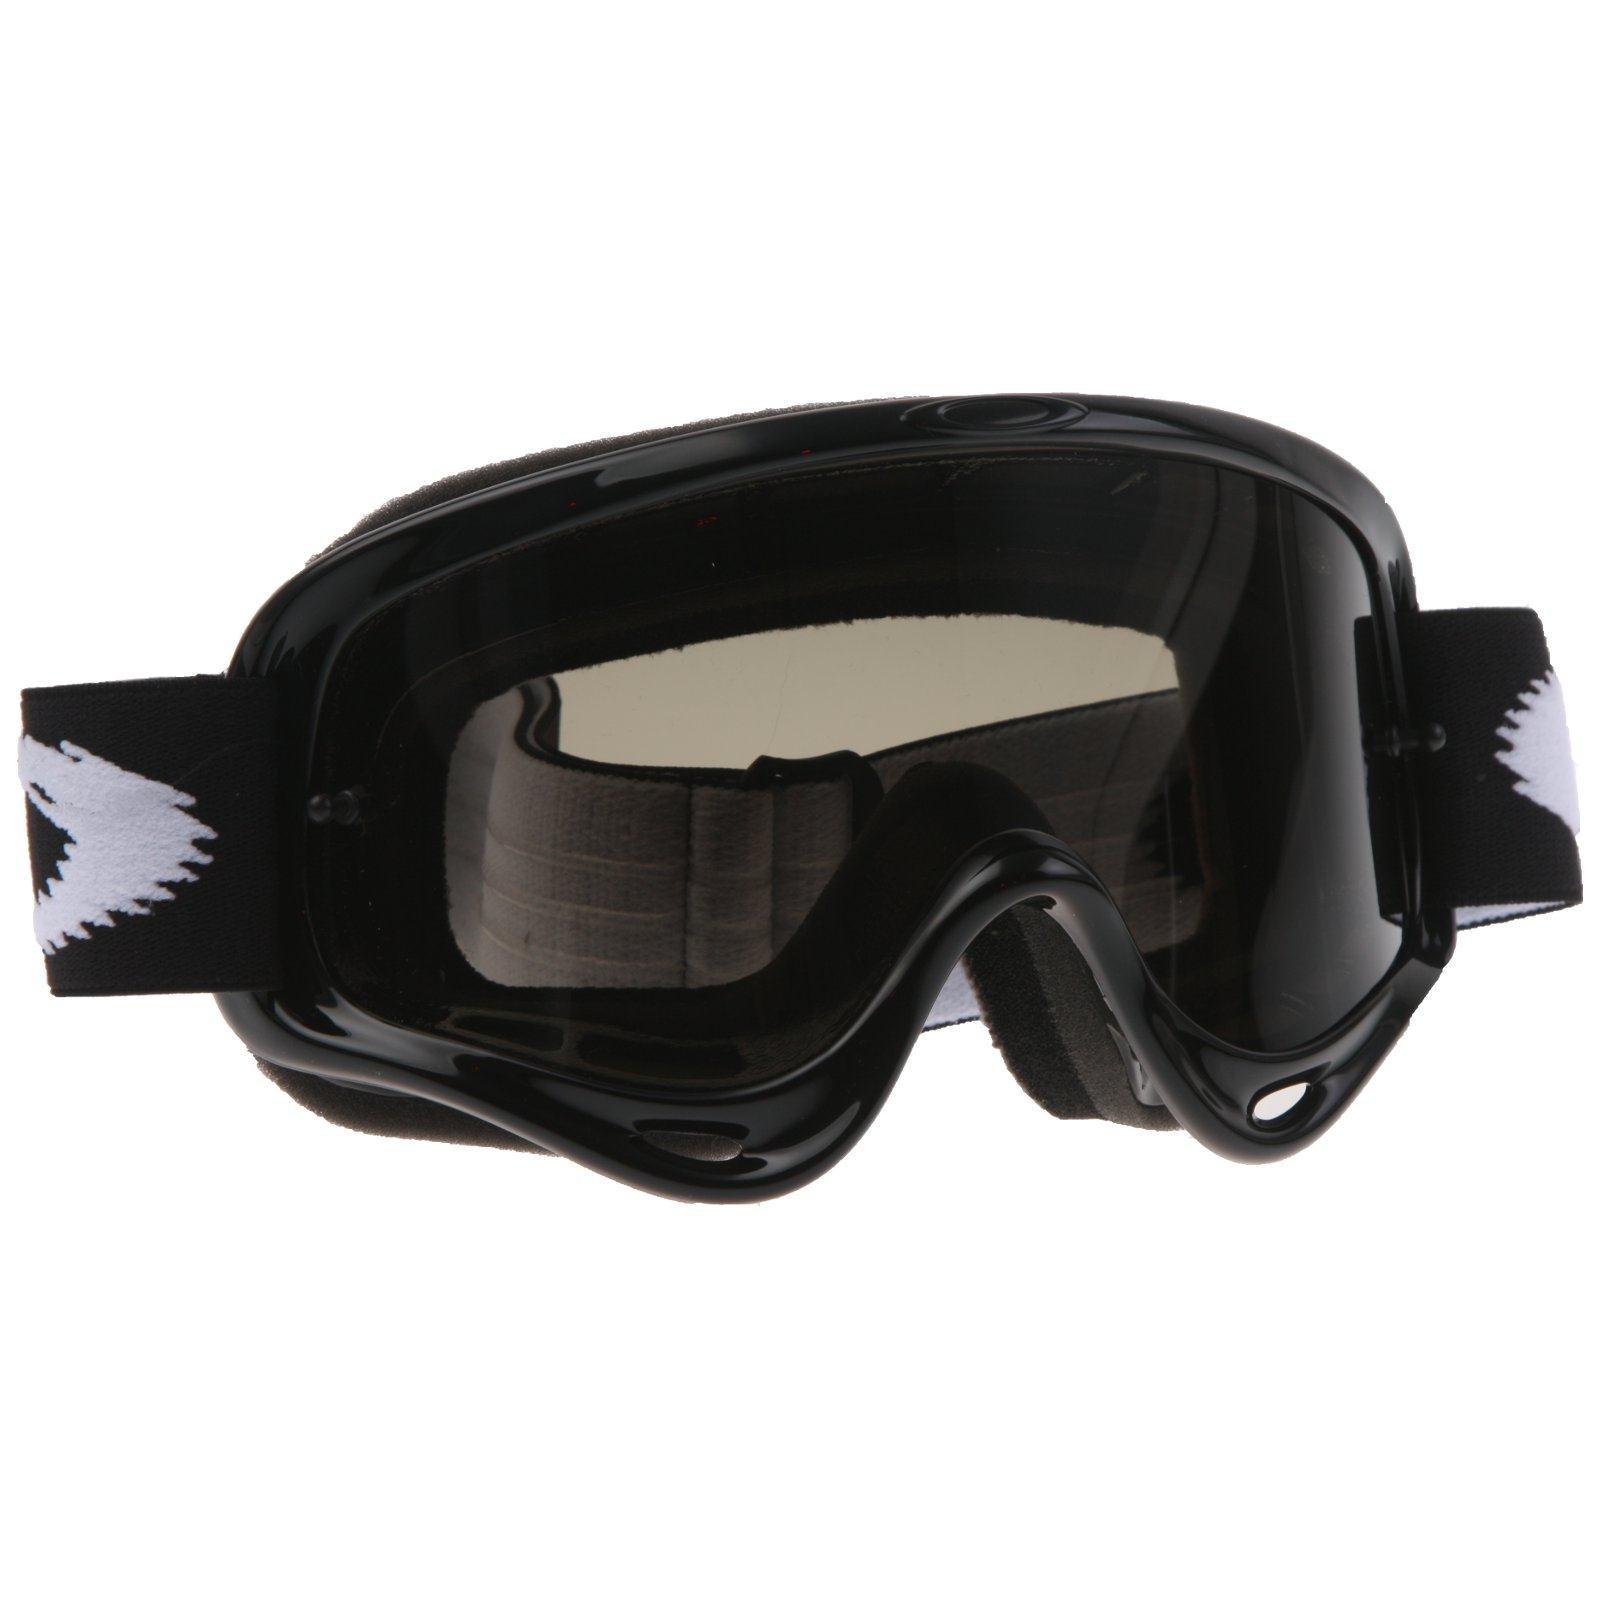 Oakley O-Frame MX Goggles (Jet Black Frame/Dk Grey Lens, One Size) by Oakley